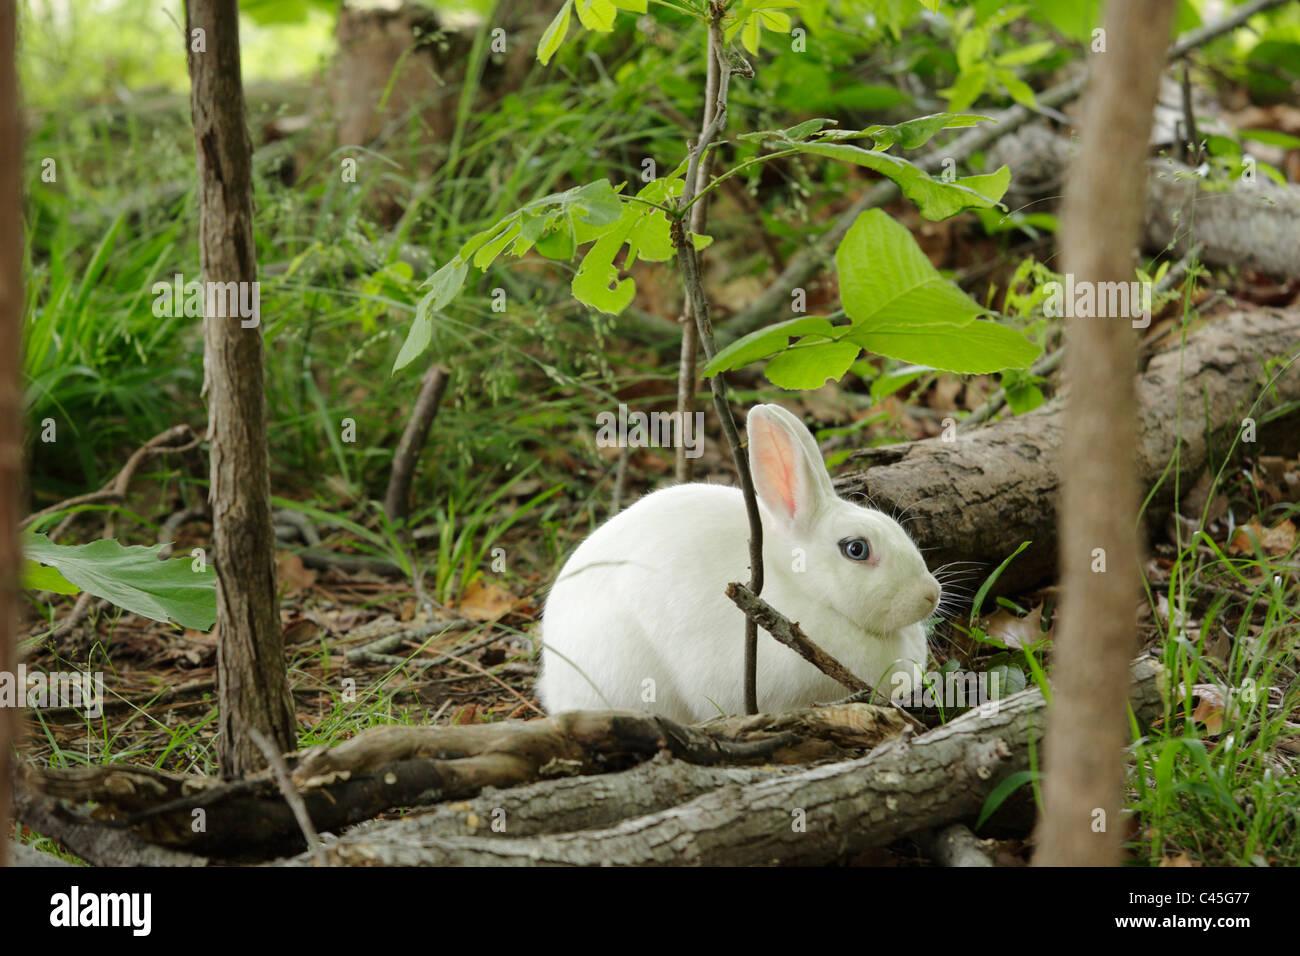 A wild, blue-eyed white rabbit, Wake County, North Carolina, USA - Stock Image